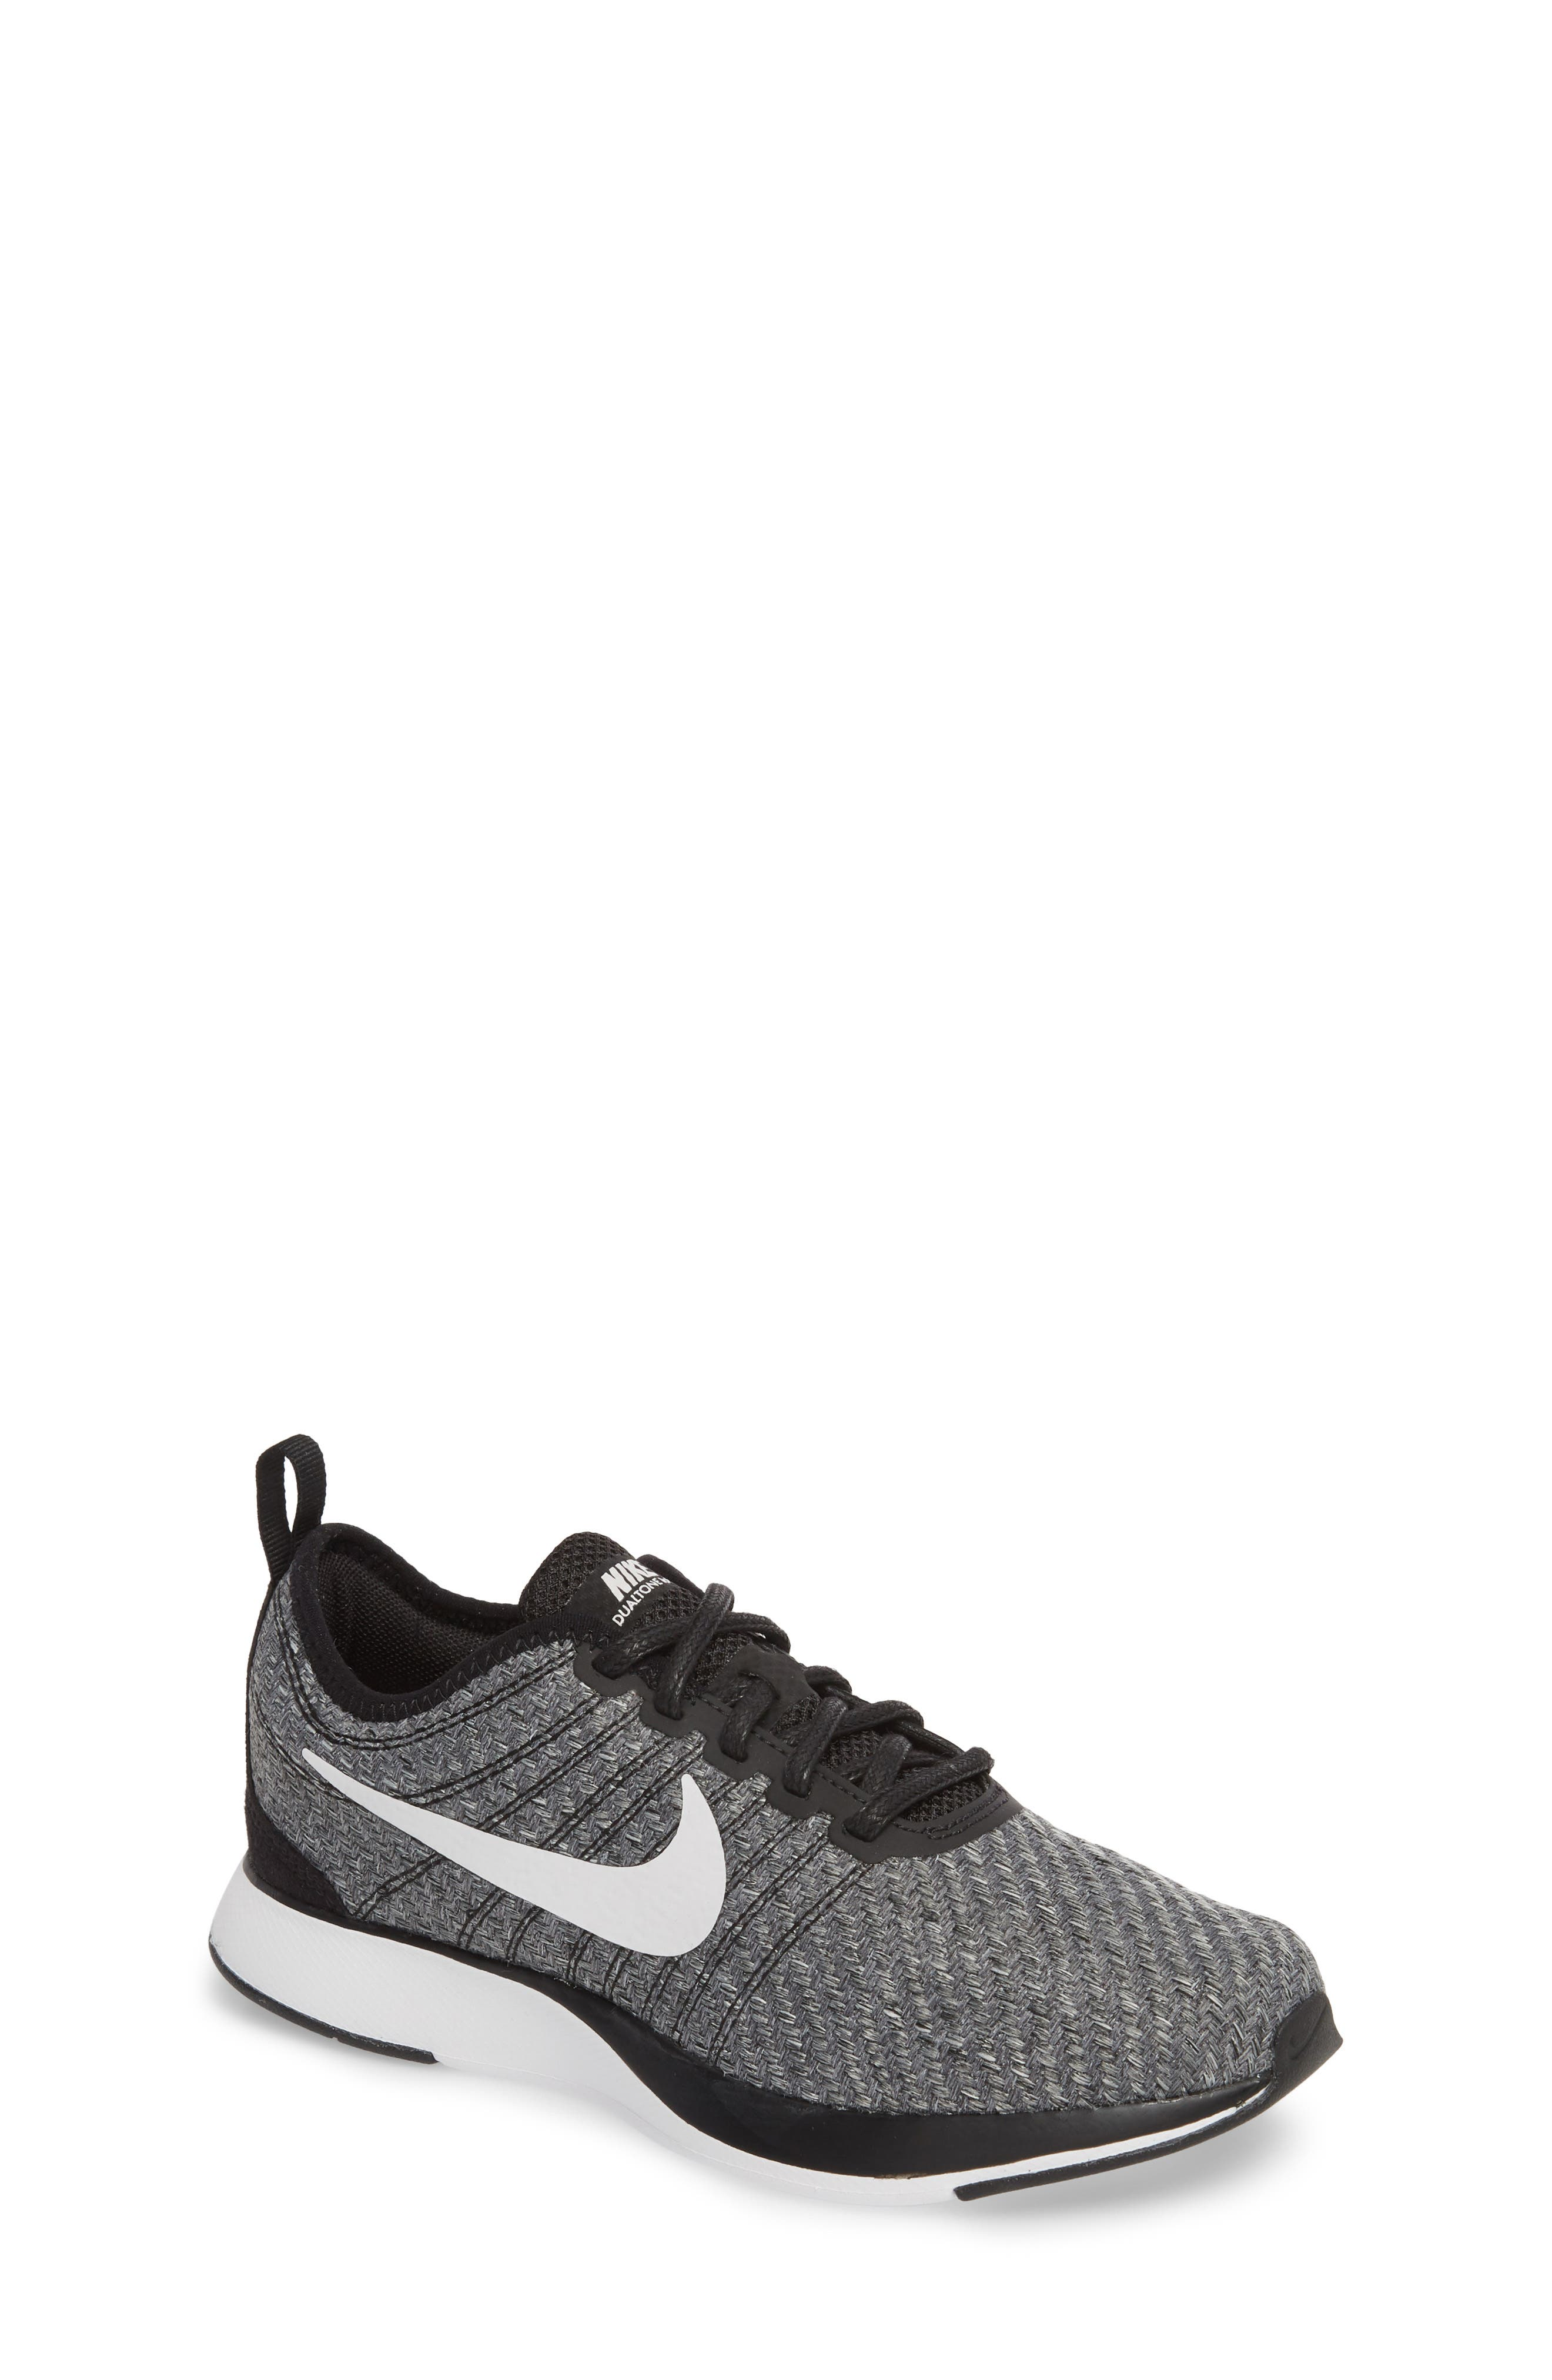 Dualtone Racer SE Sneaker,                             Main thumbnail 1, color,                             Black/ Vast Grey/ White